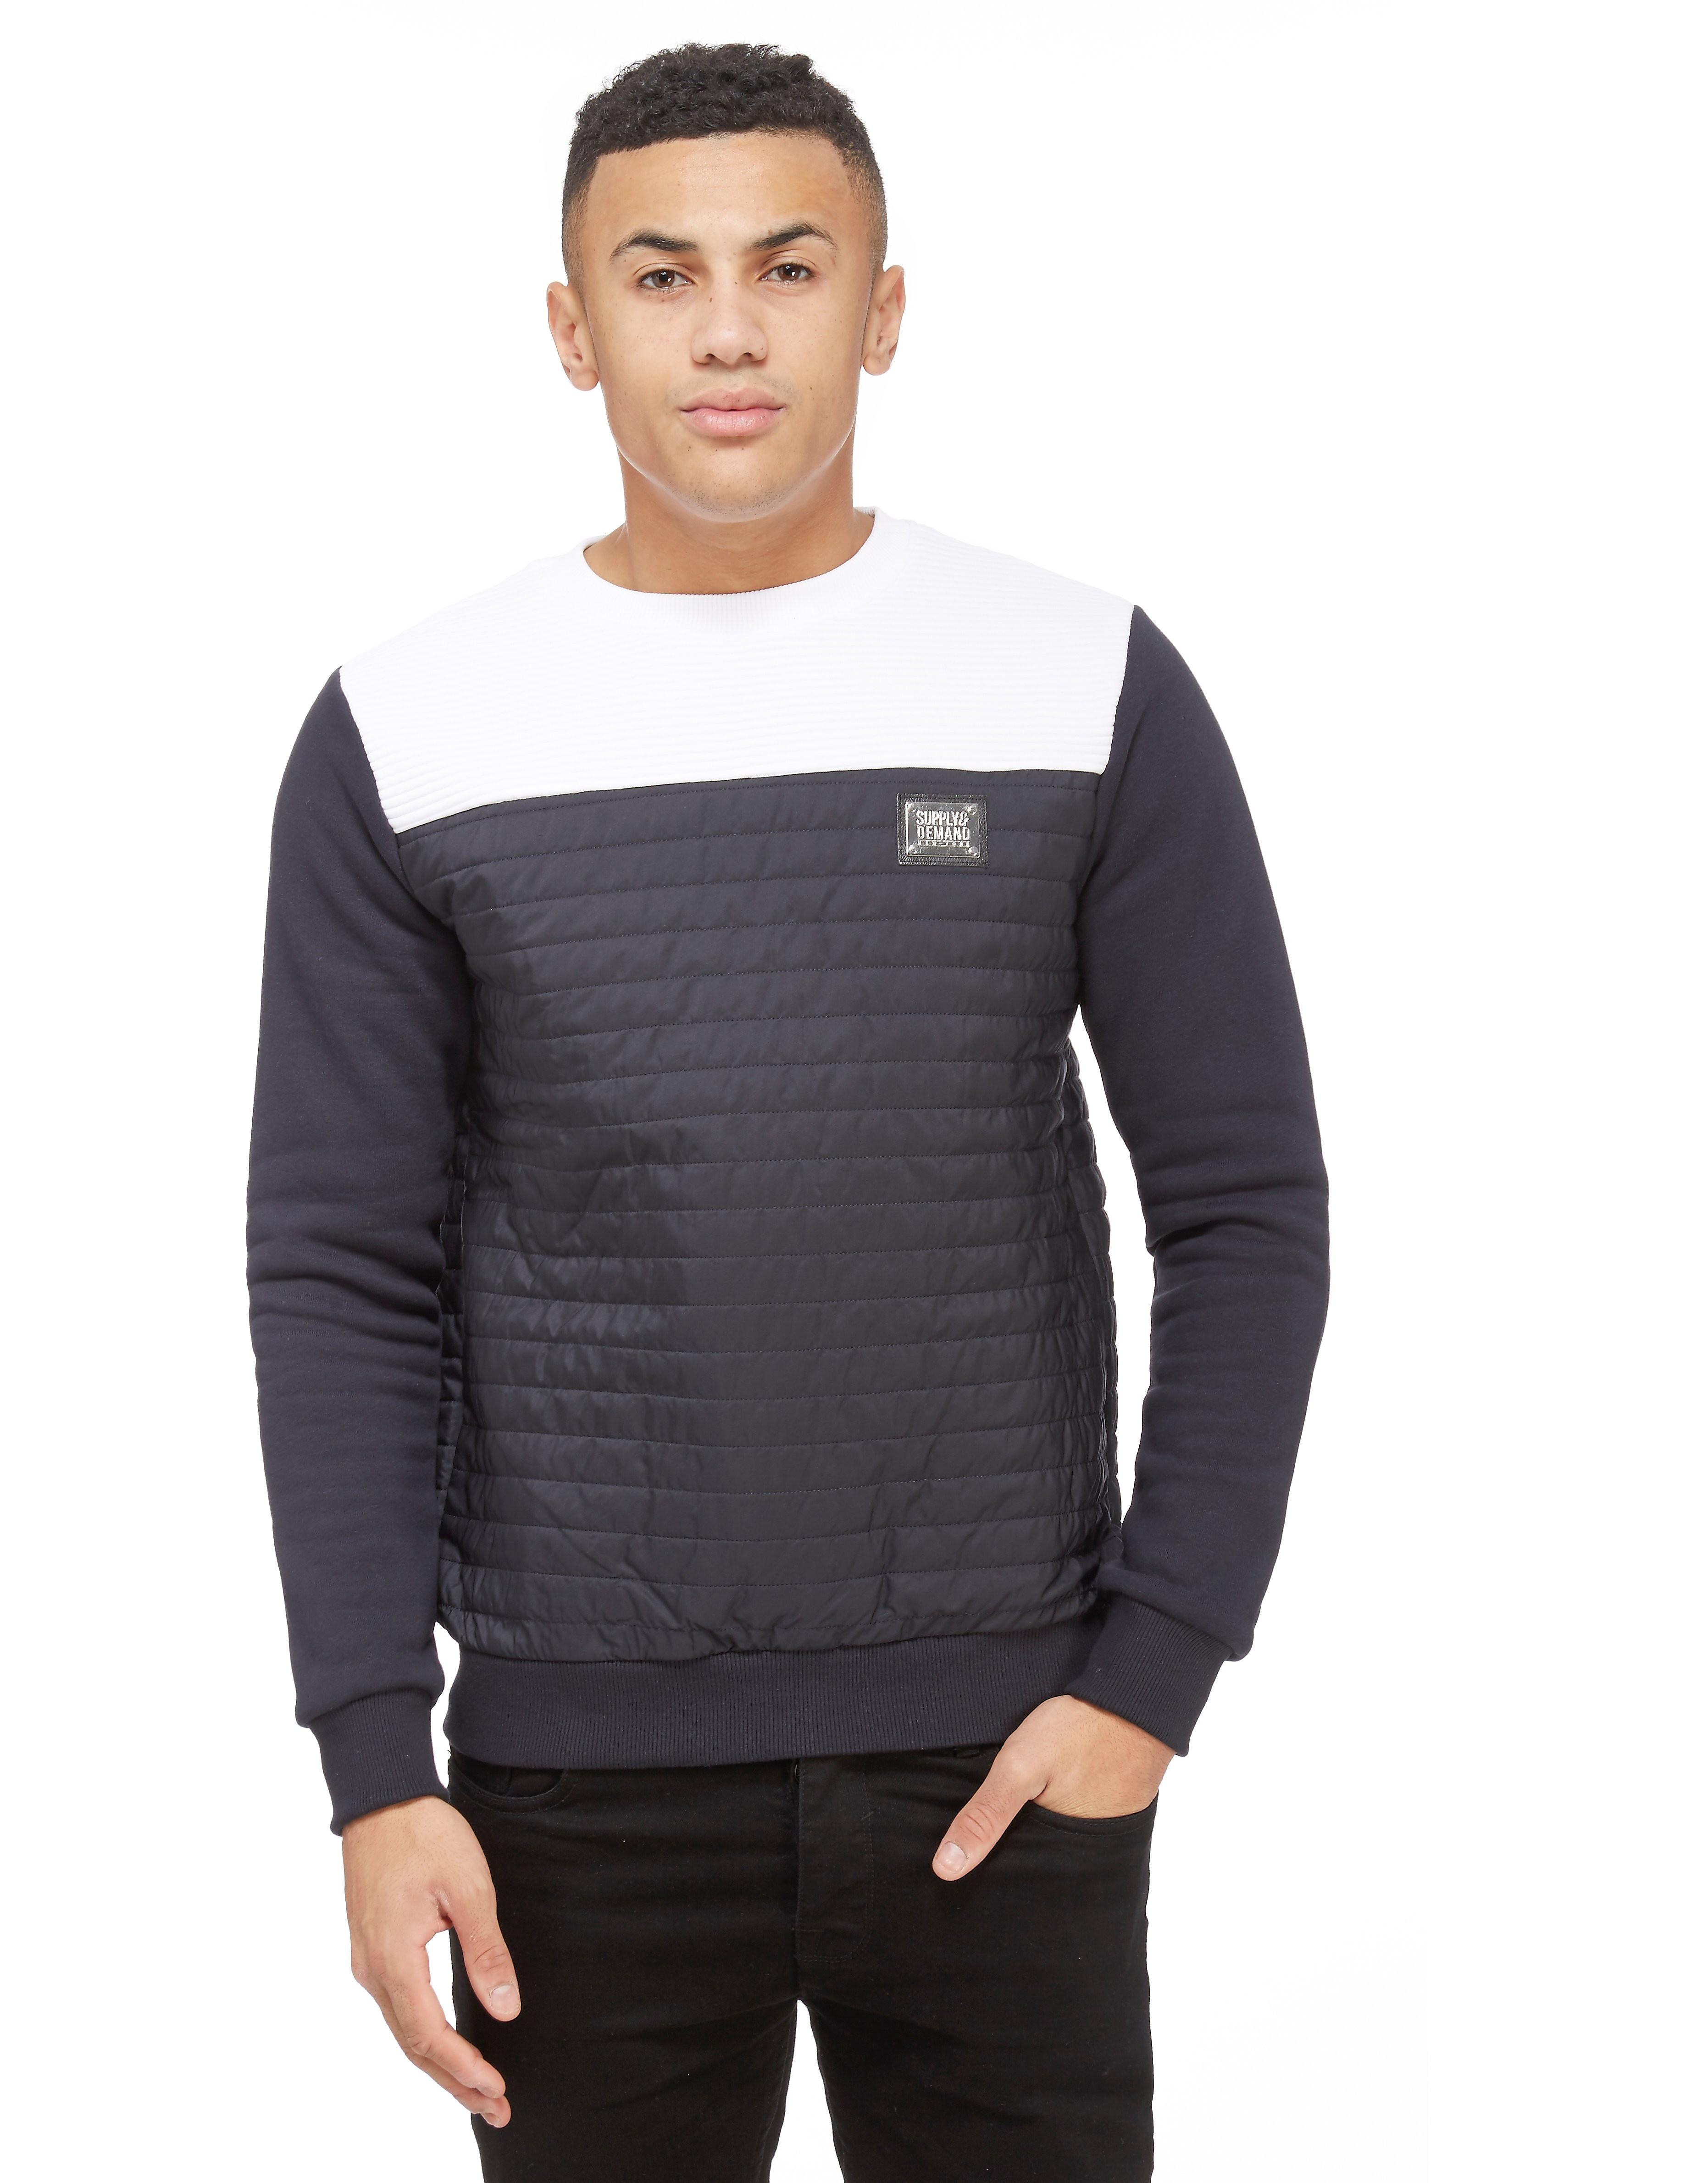 Supply & Demand Elementary Crew Sweatshirt